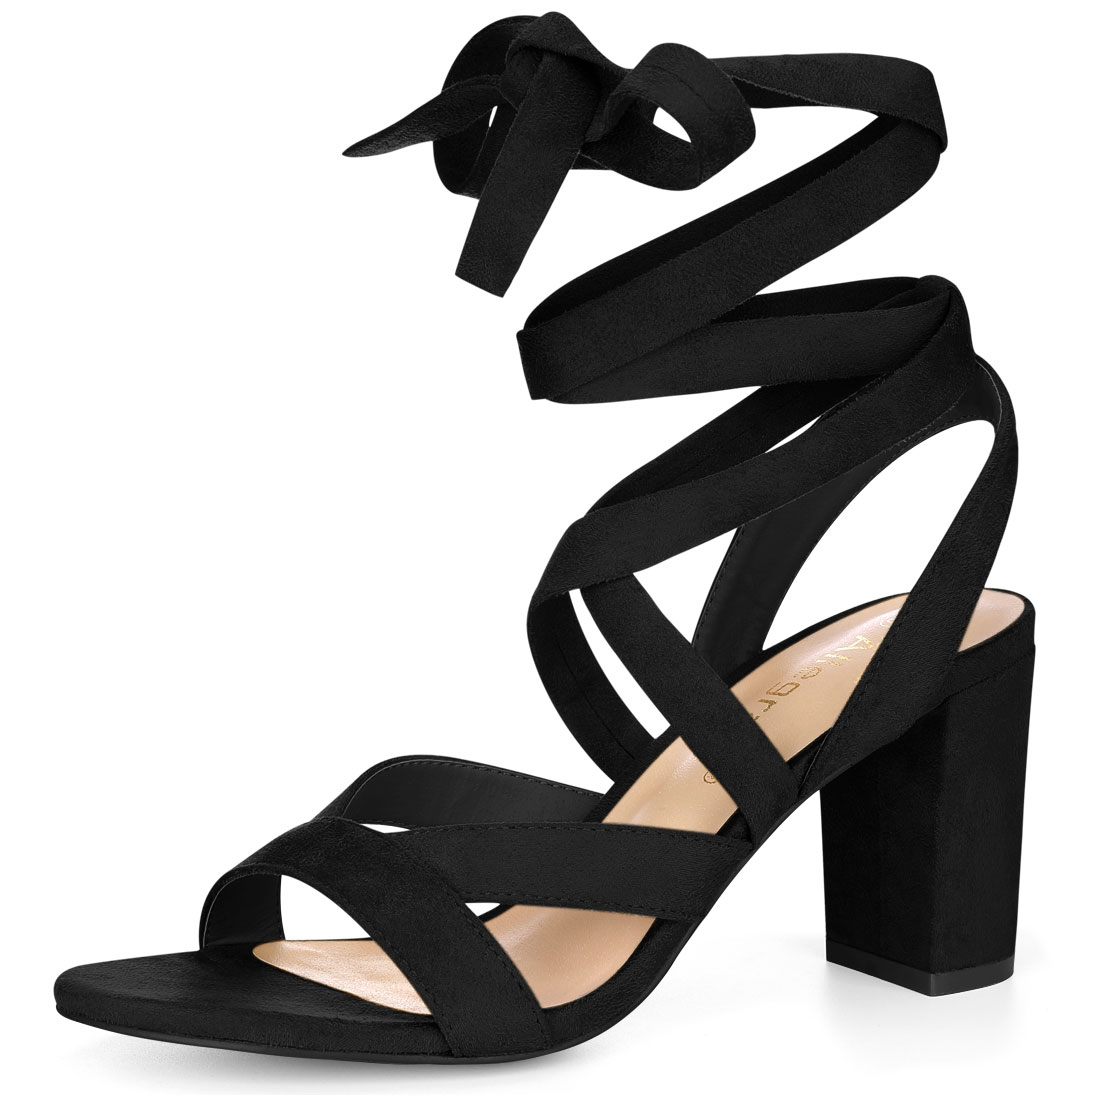 Allegra K Women Crisscross Lace Up Chunky Heel Sandals Black US 5.5